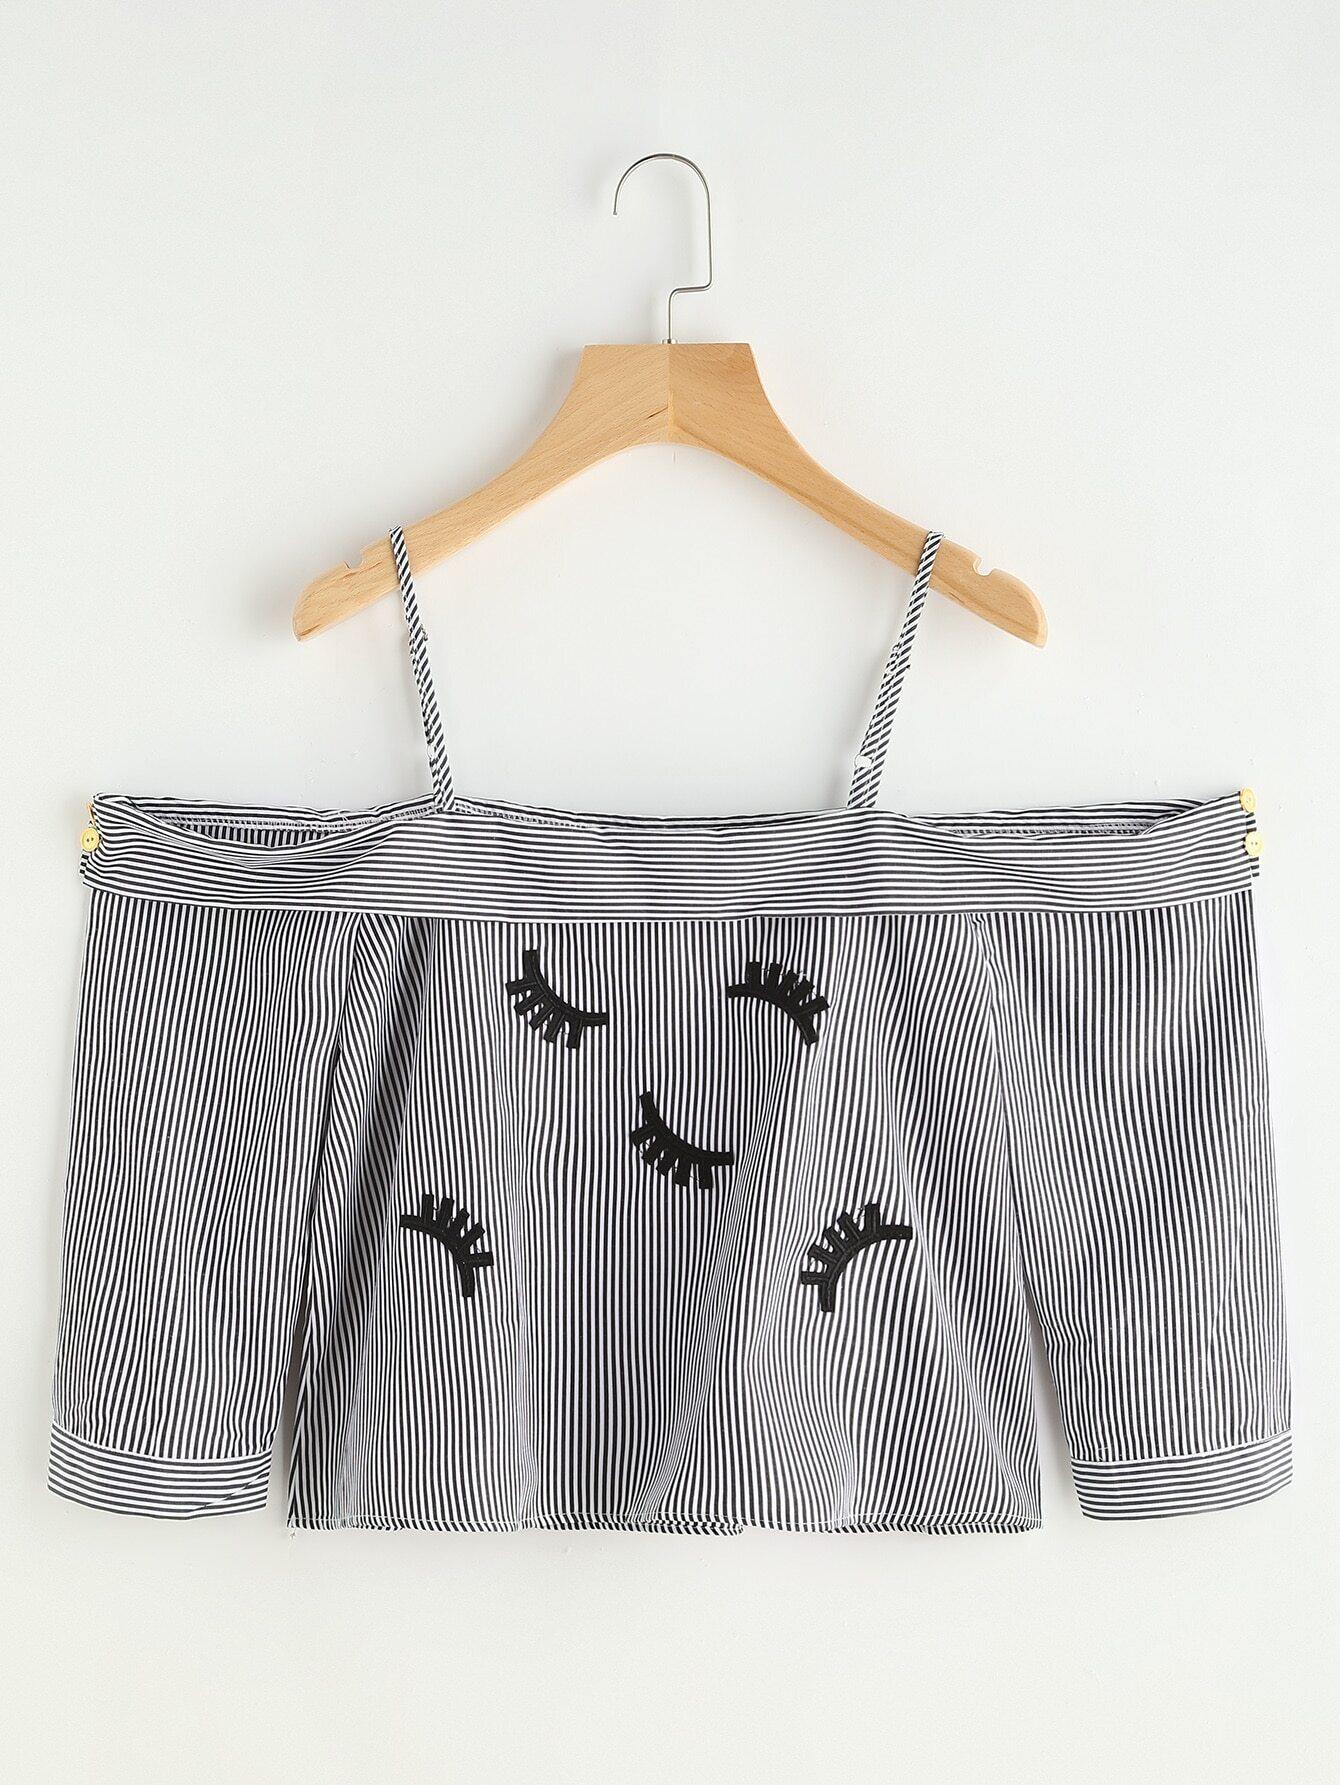 Cold Shoulder Eyelash Embroidery Crop Top blouse170330104